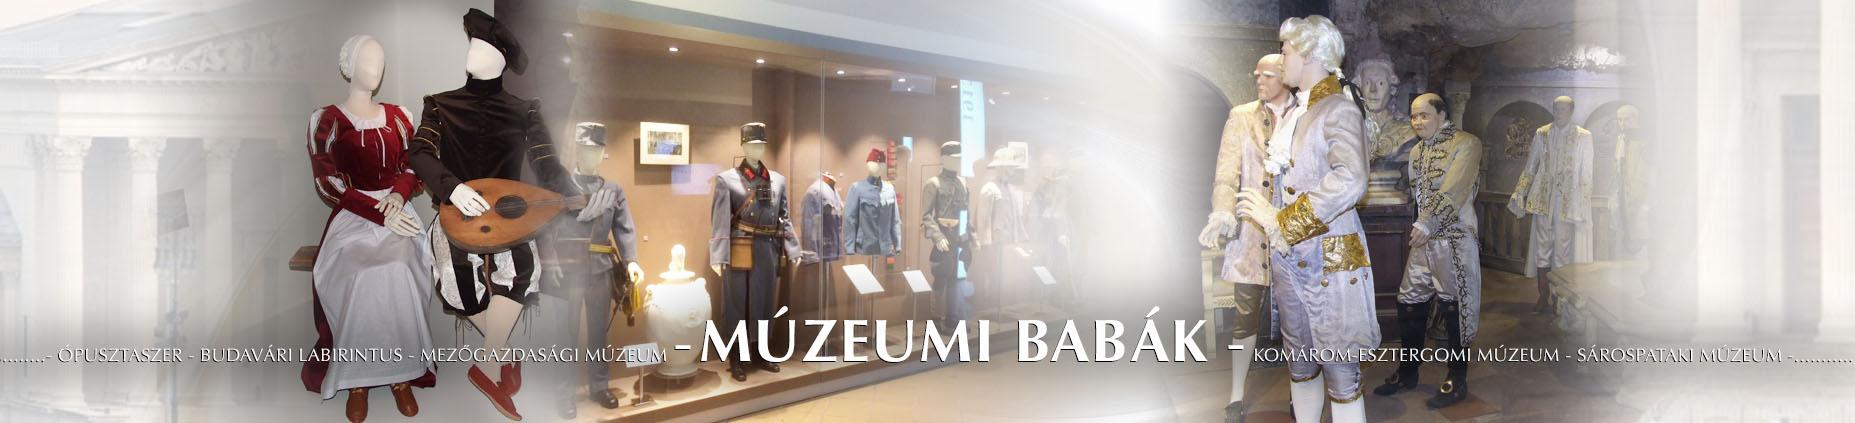 banner muzeumi